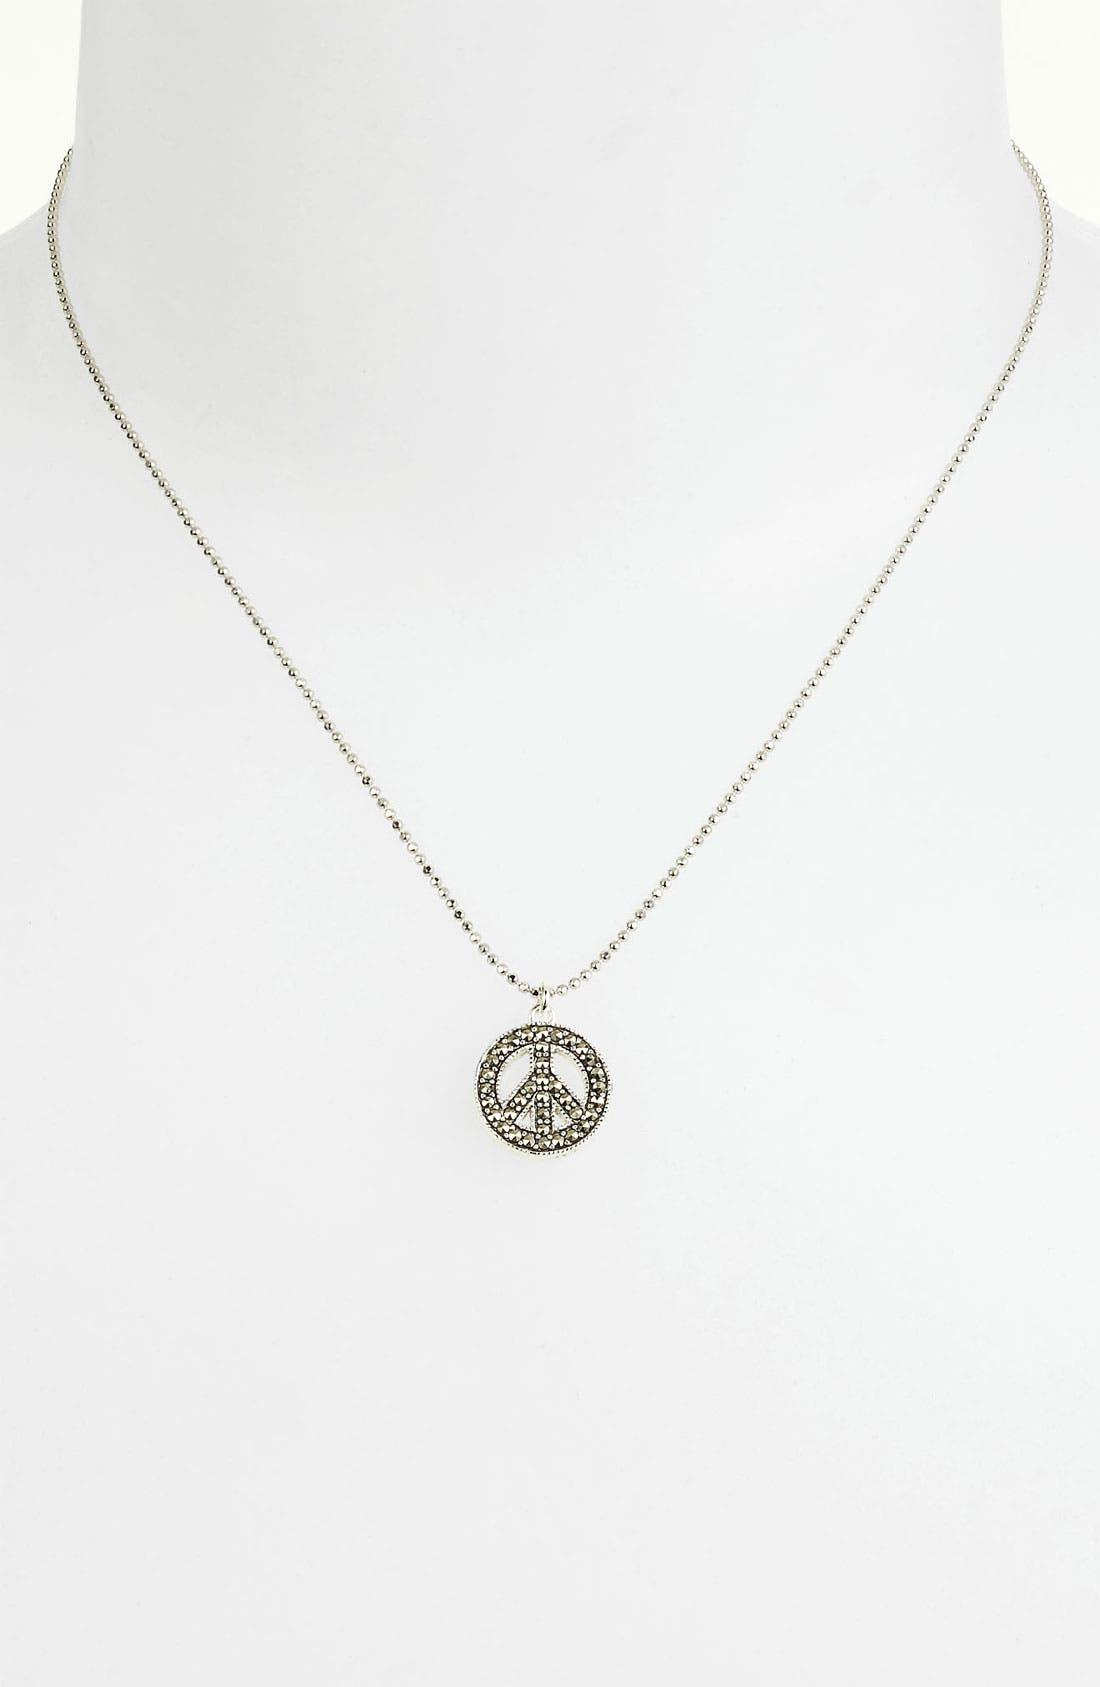 Alternate Image 1 Selected - Judith Jack Reversible Pavé Peace Sign Pendant Necklace